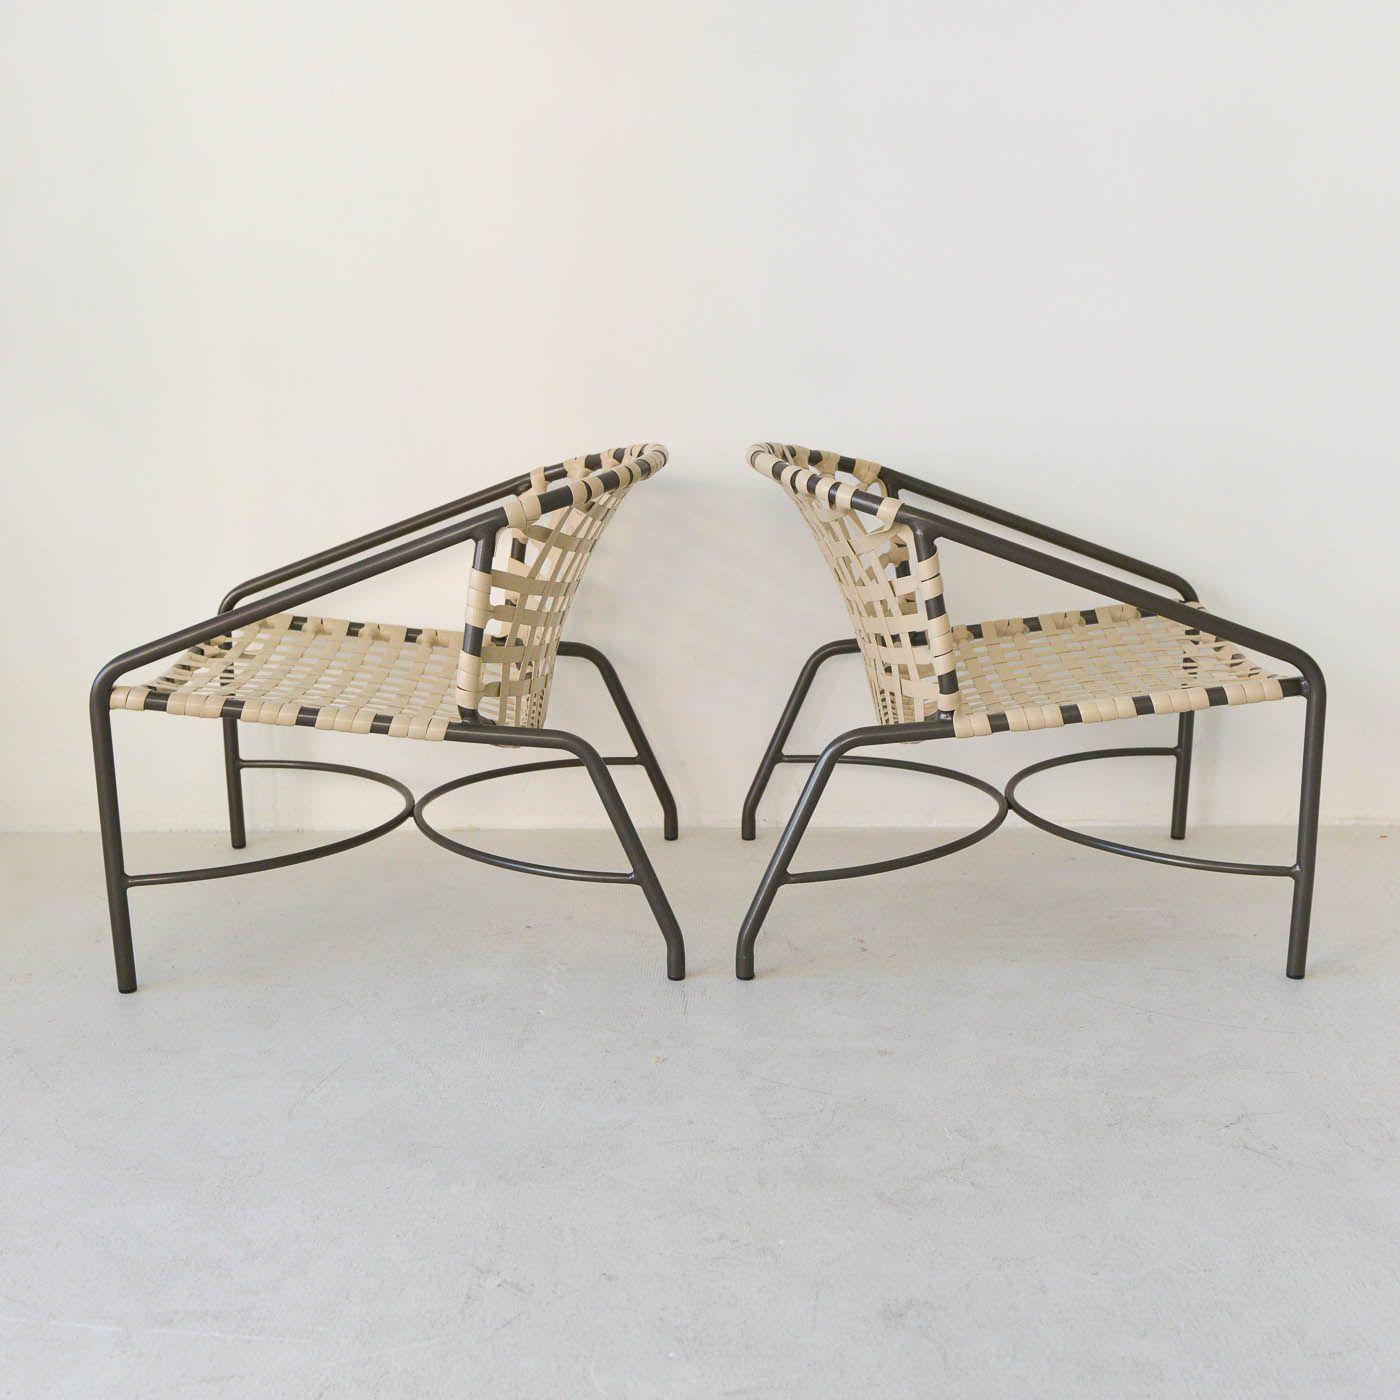 Sold Vintage Kantan Chairs By Tadao Inouye For Brown Jordan The Modern Vault Brown Jordan Patio Chairs Chair